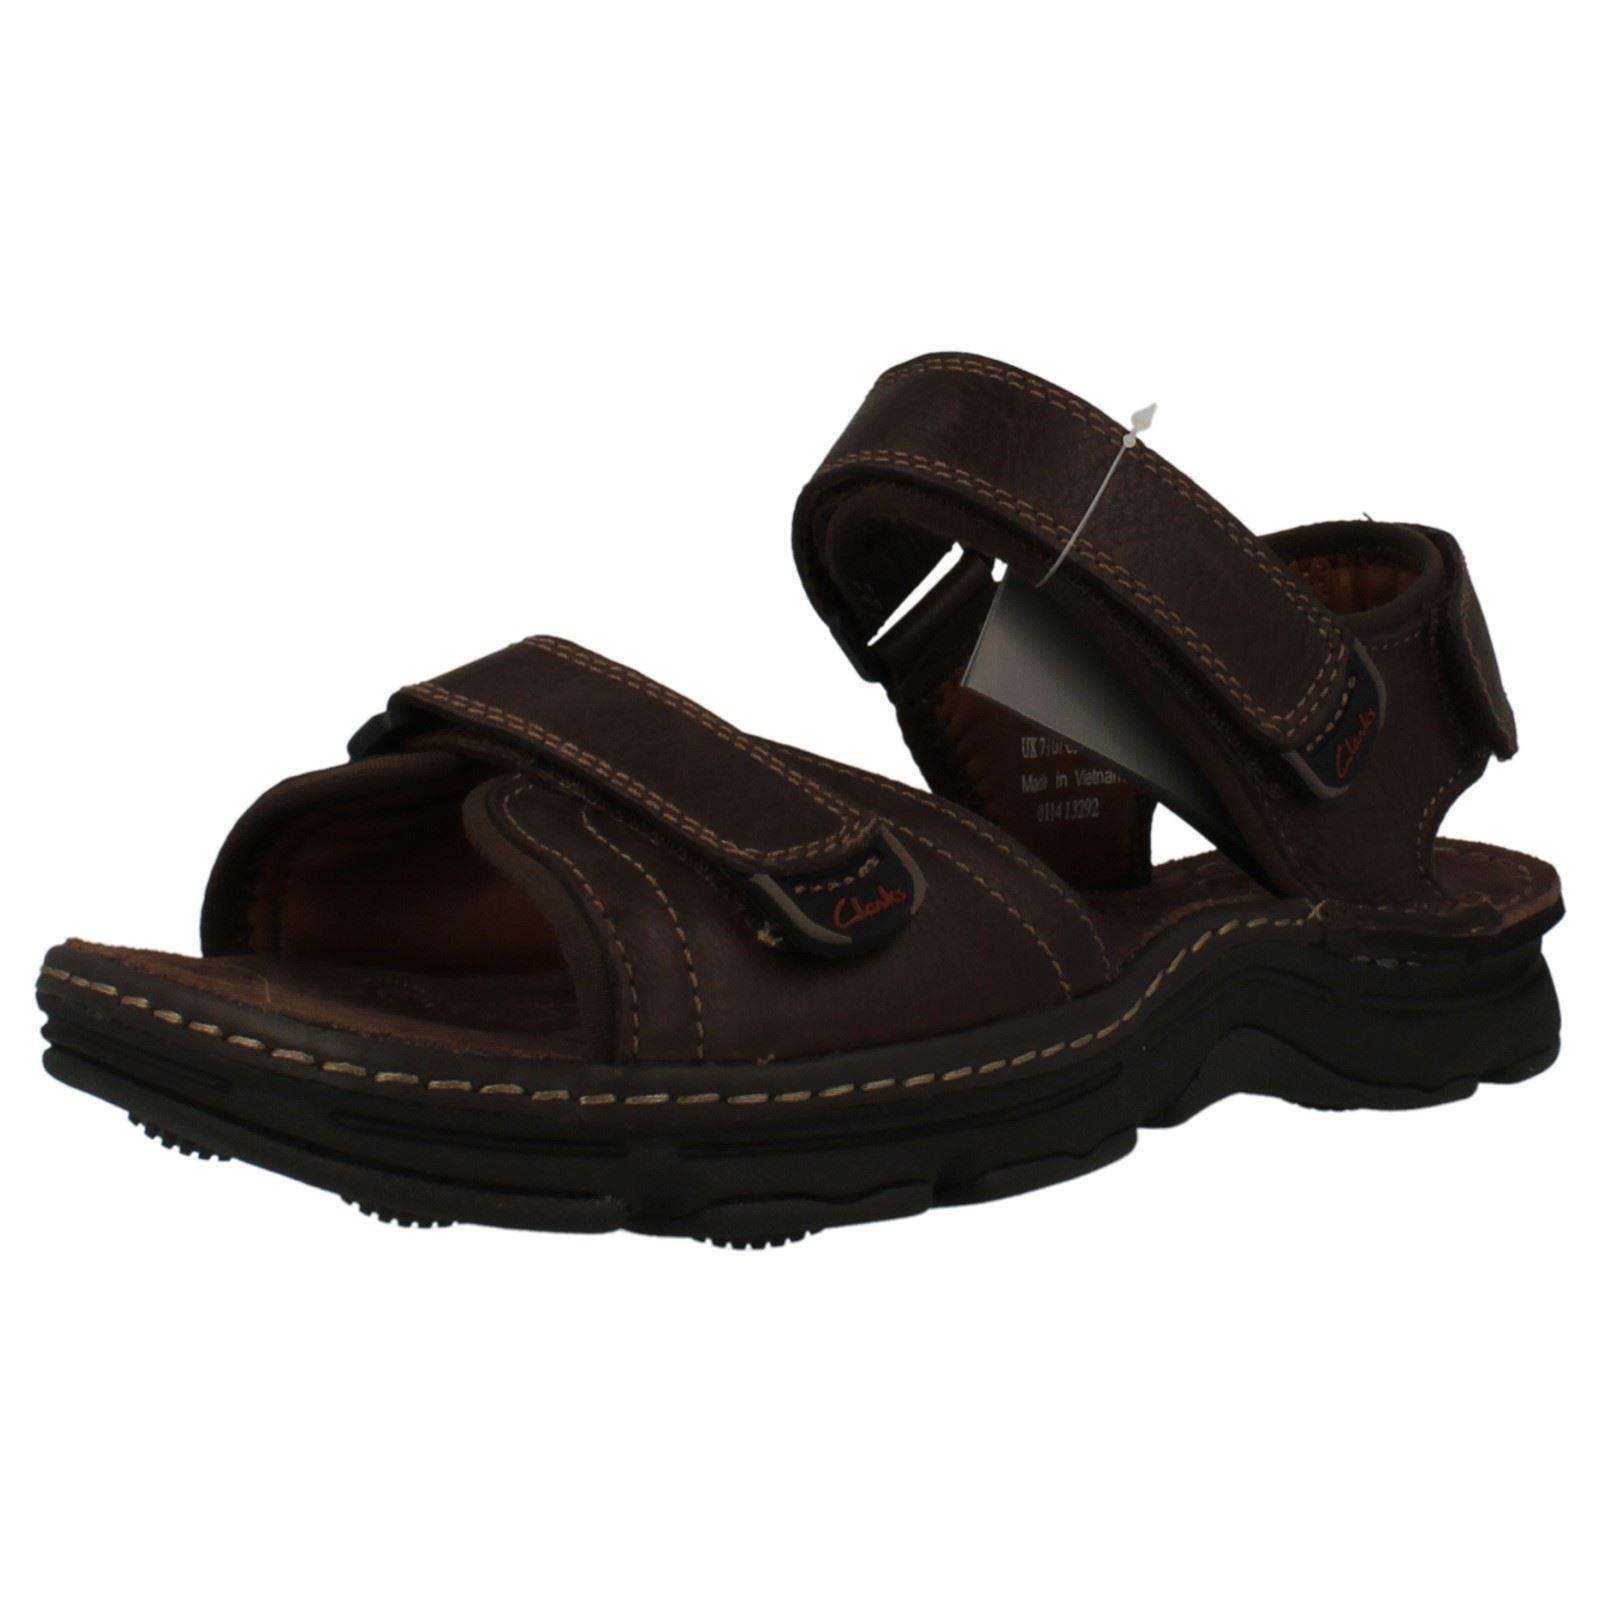 clarks active air sandals mens